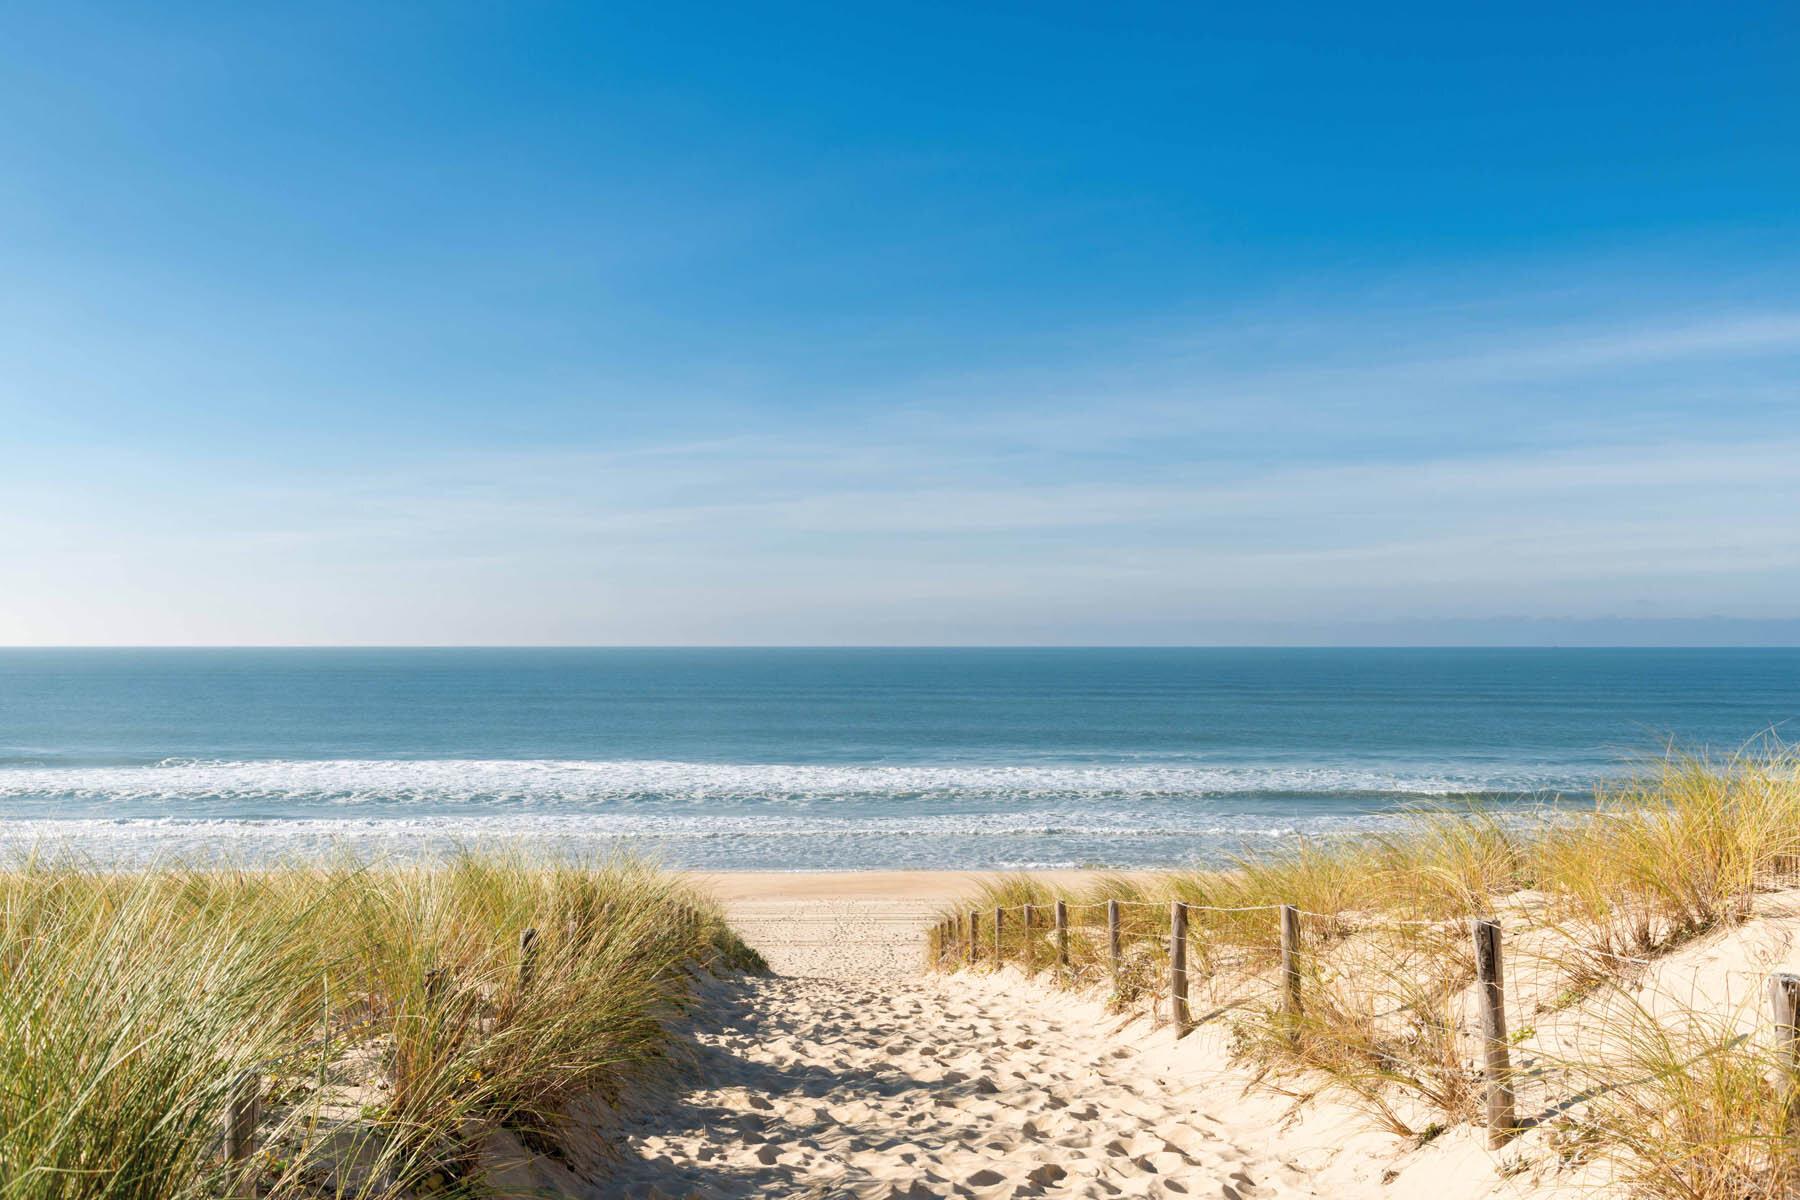 PlateART Duschrückwand mit Motiv Strand und Meer